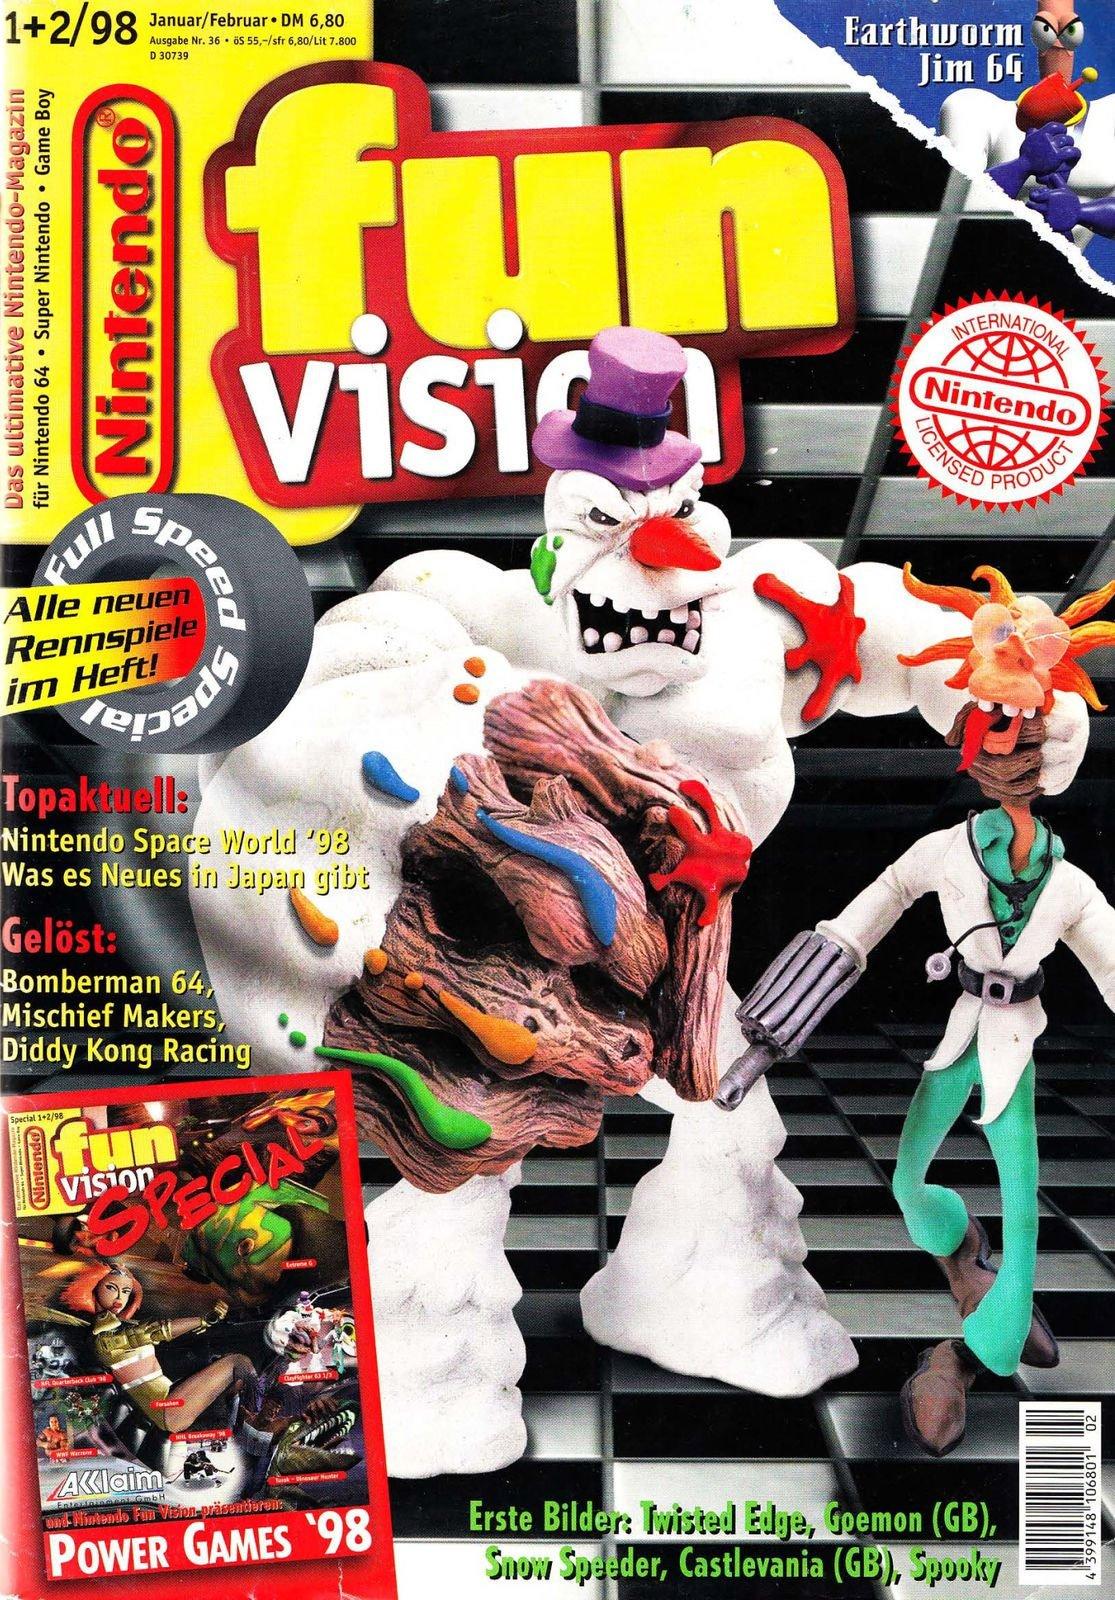 Nintendo Fun Vision Issue 46 (January / February 1998)